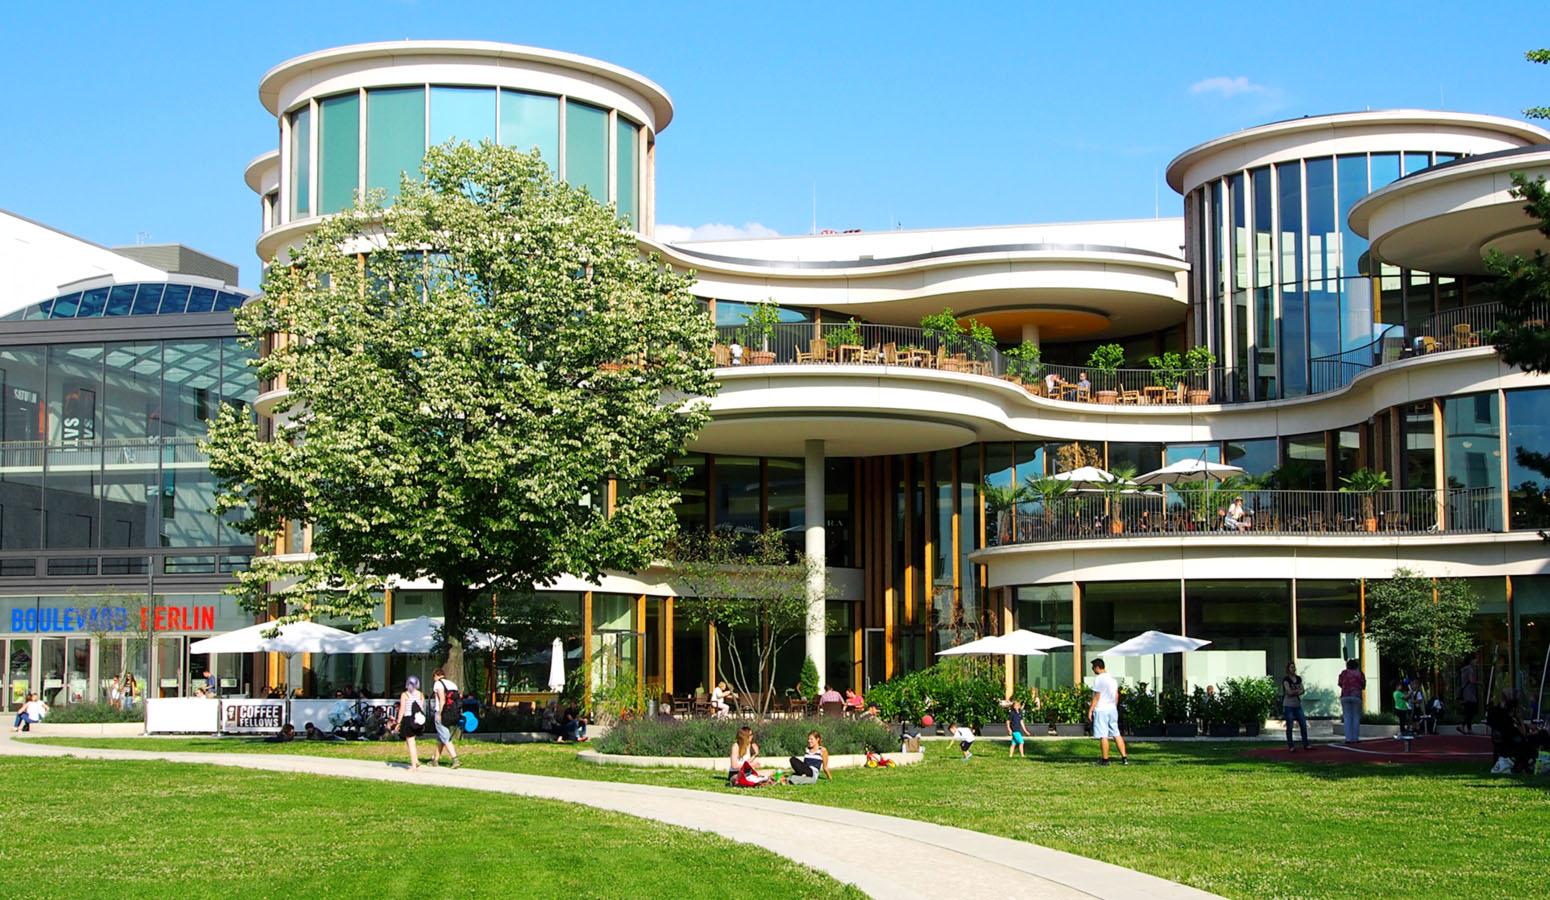 STrauma Landschaftsarchitektur Berlin landscape architects Harry Bresslau Park Berlin Lageplan